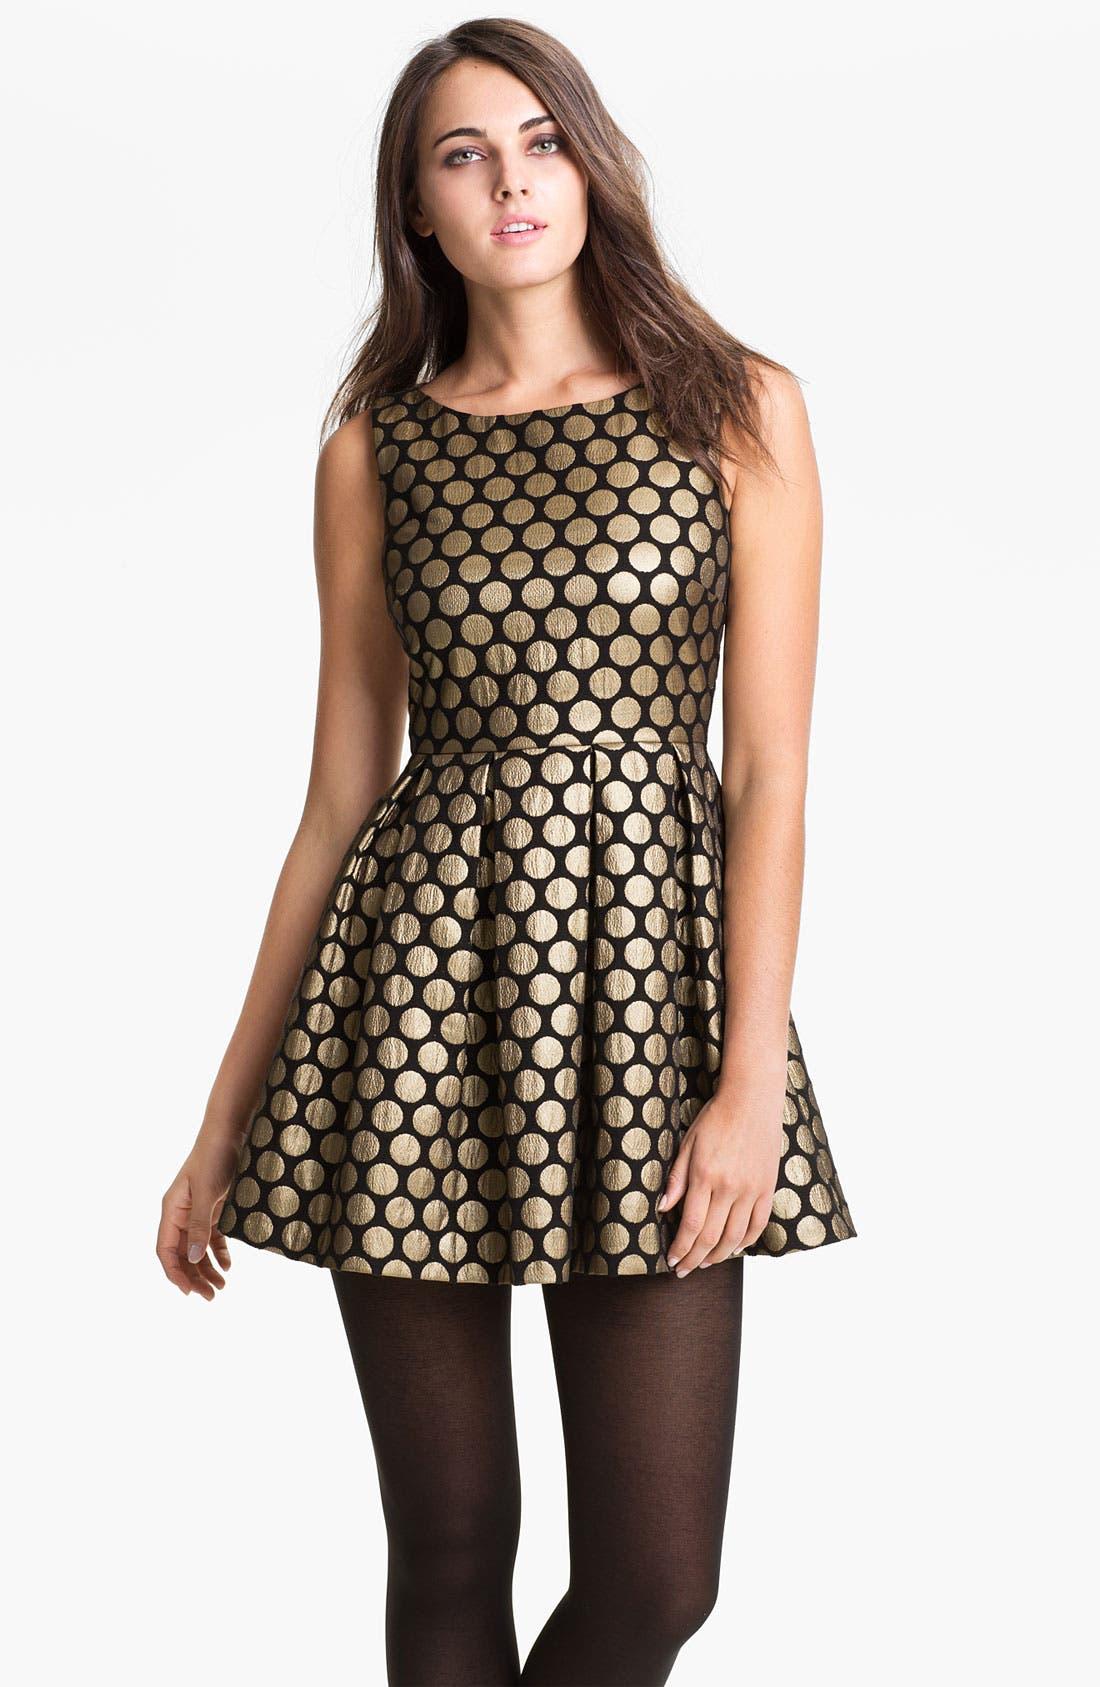 Alternate Image 1 Selected - Vince Camuto Dot Jacquard Dress